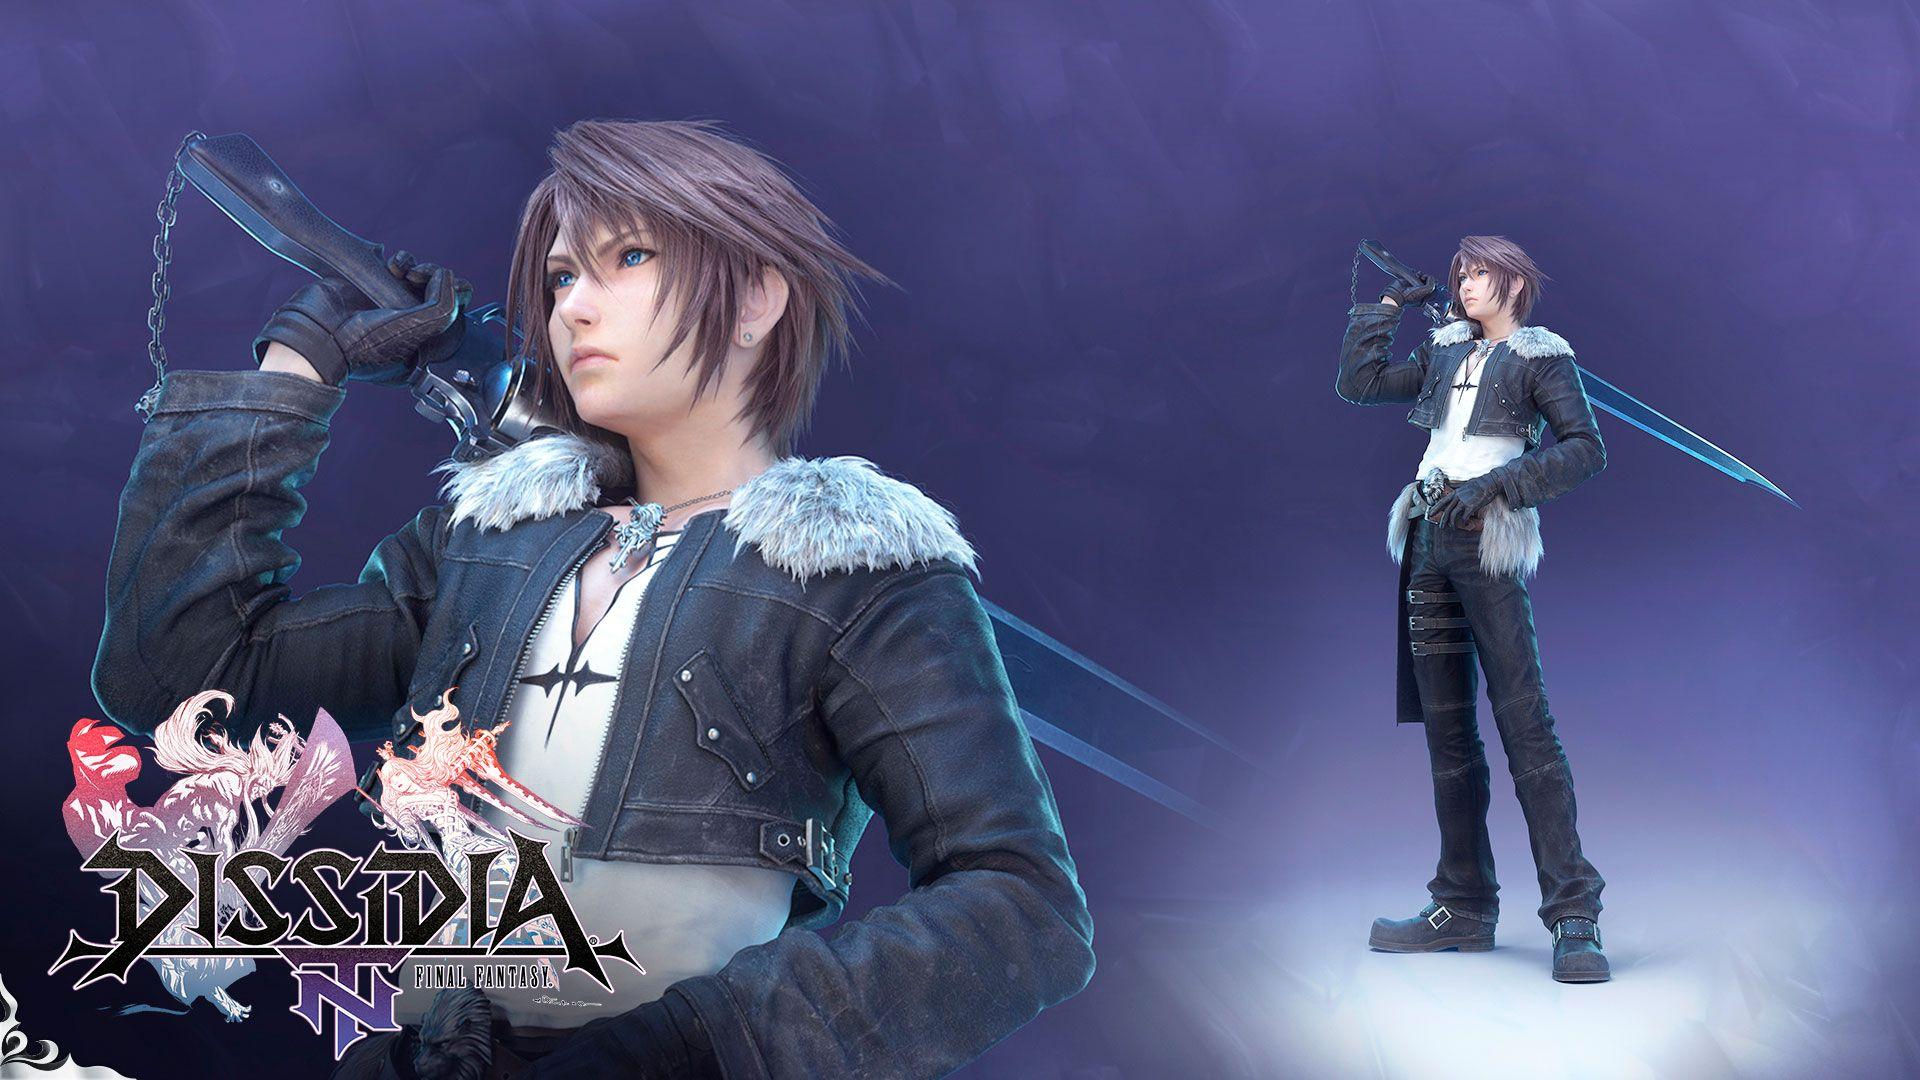 Videogame Dissidia Final Fantasy Nt Final Fantasy Squall Leonhart